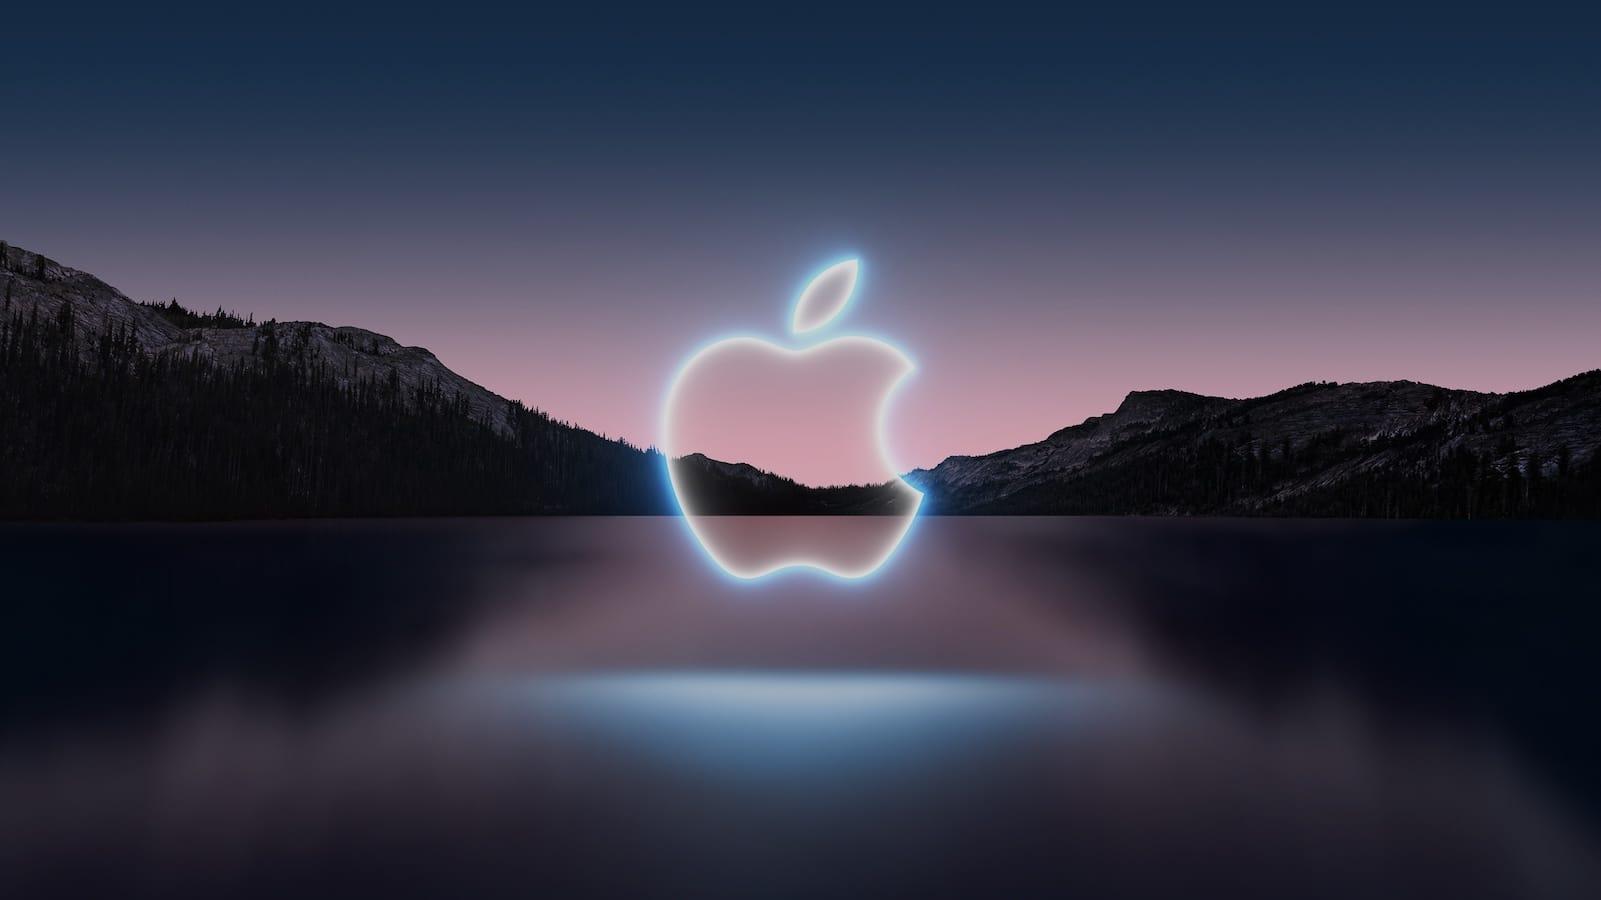 Apple Event September 2021 highlights